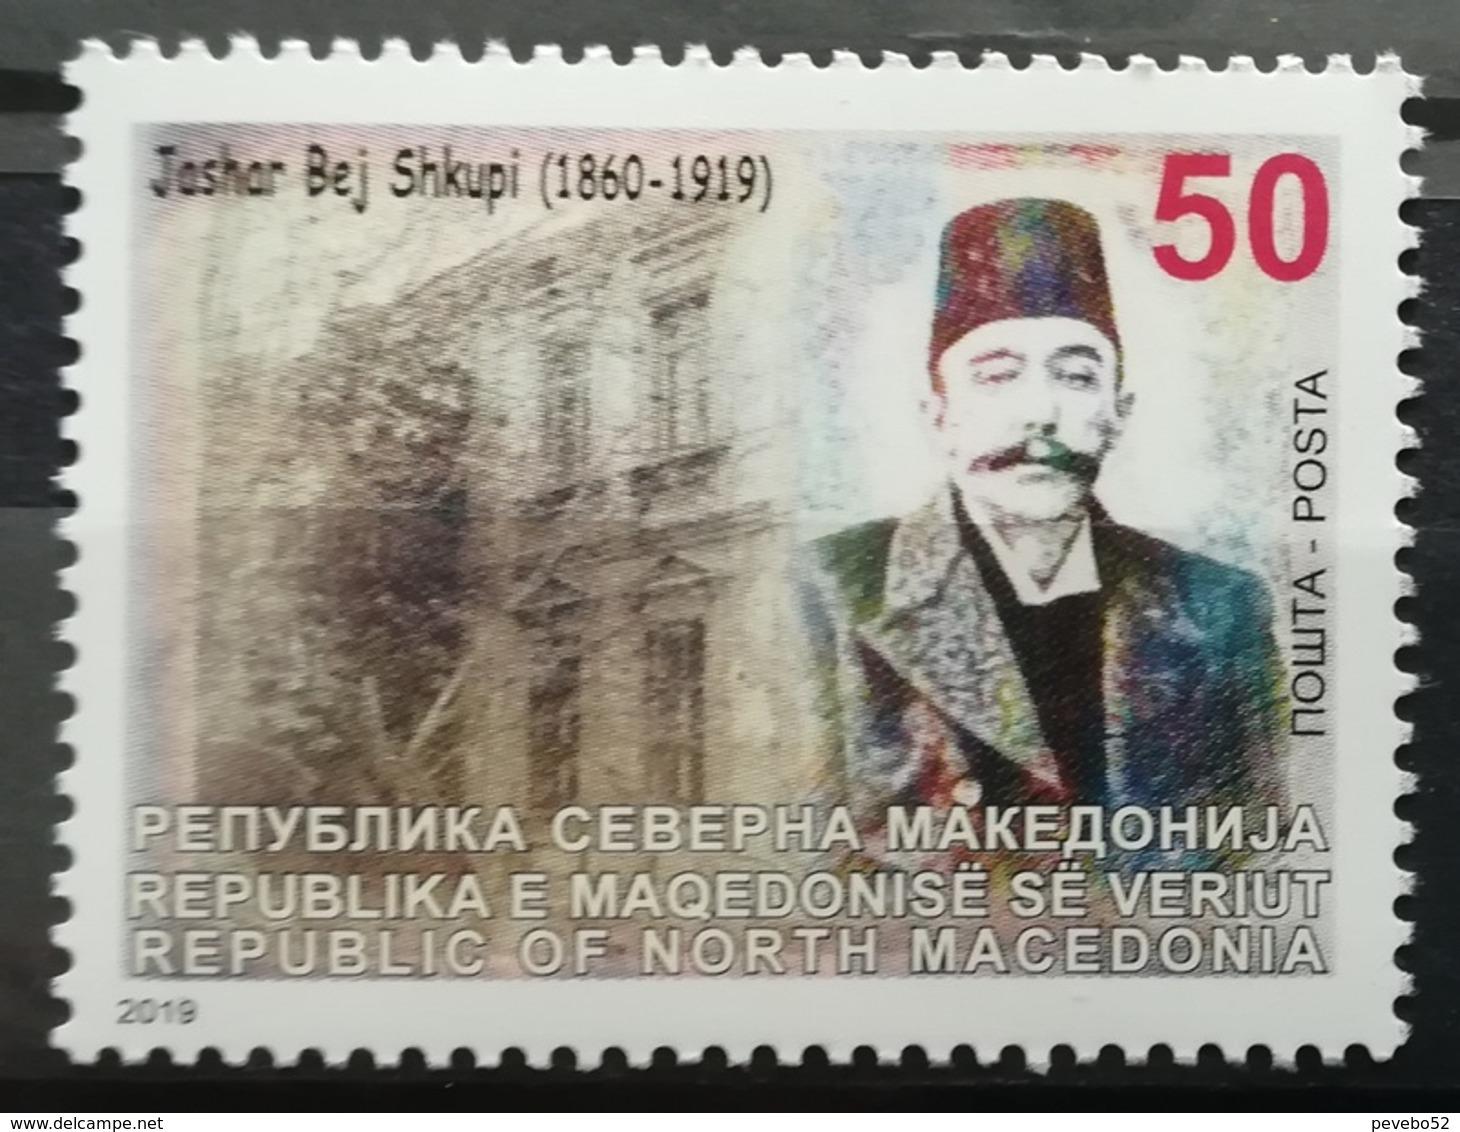 MACEDONIA 2019 - 100th Ann. Of The Death Of Jasar Bej Skupi MNH - Macédoine